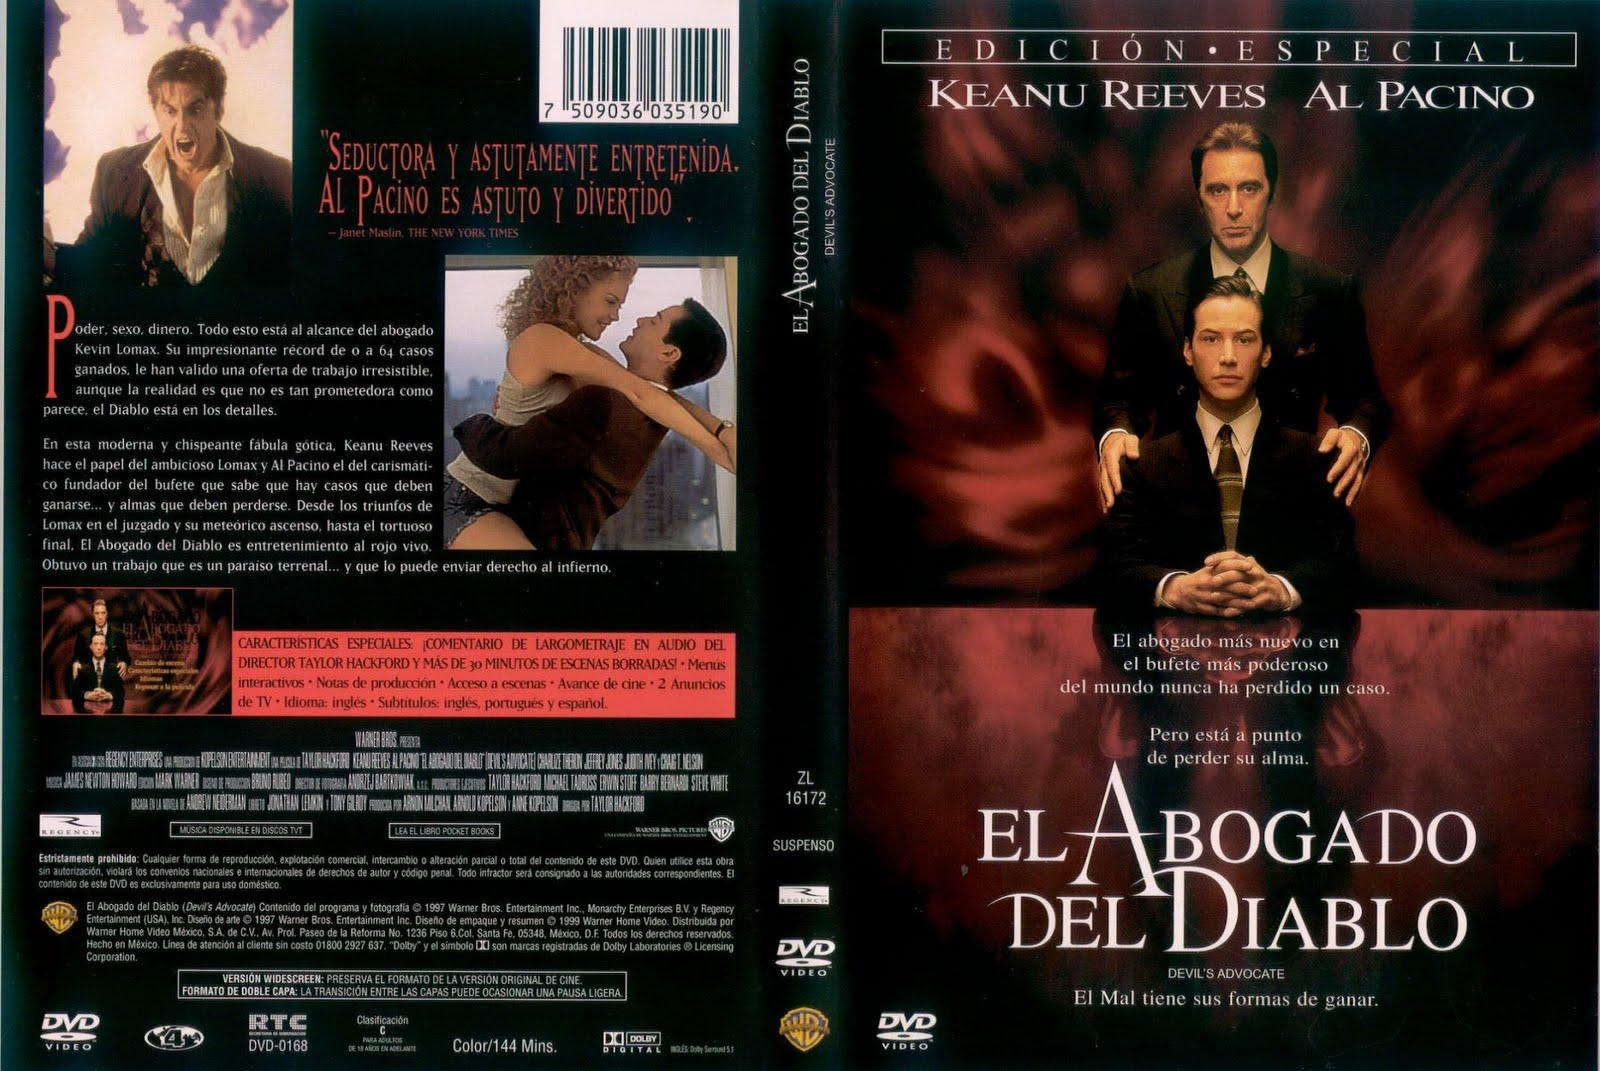 http://4.bp.blogspot.com/_PdyBoYtAb6k/TUdk_DyK_tI/AAAAAAAAPSI/4bdHbIx9q5Y/s1600/El_Abogado_Del_Diablo_-_Region_4_por_shen75_%255Bdvd%255D_80.jpg